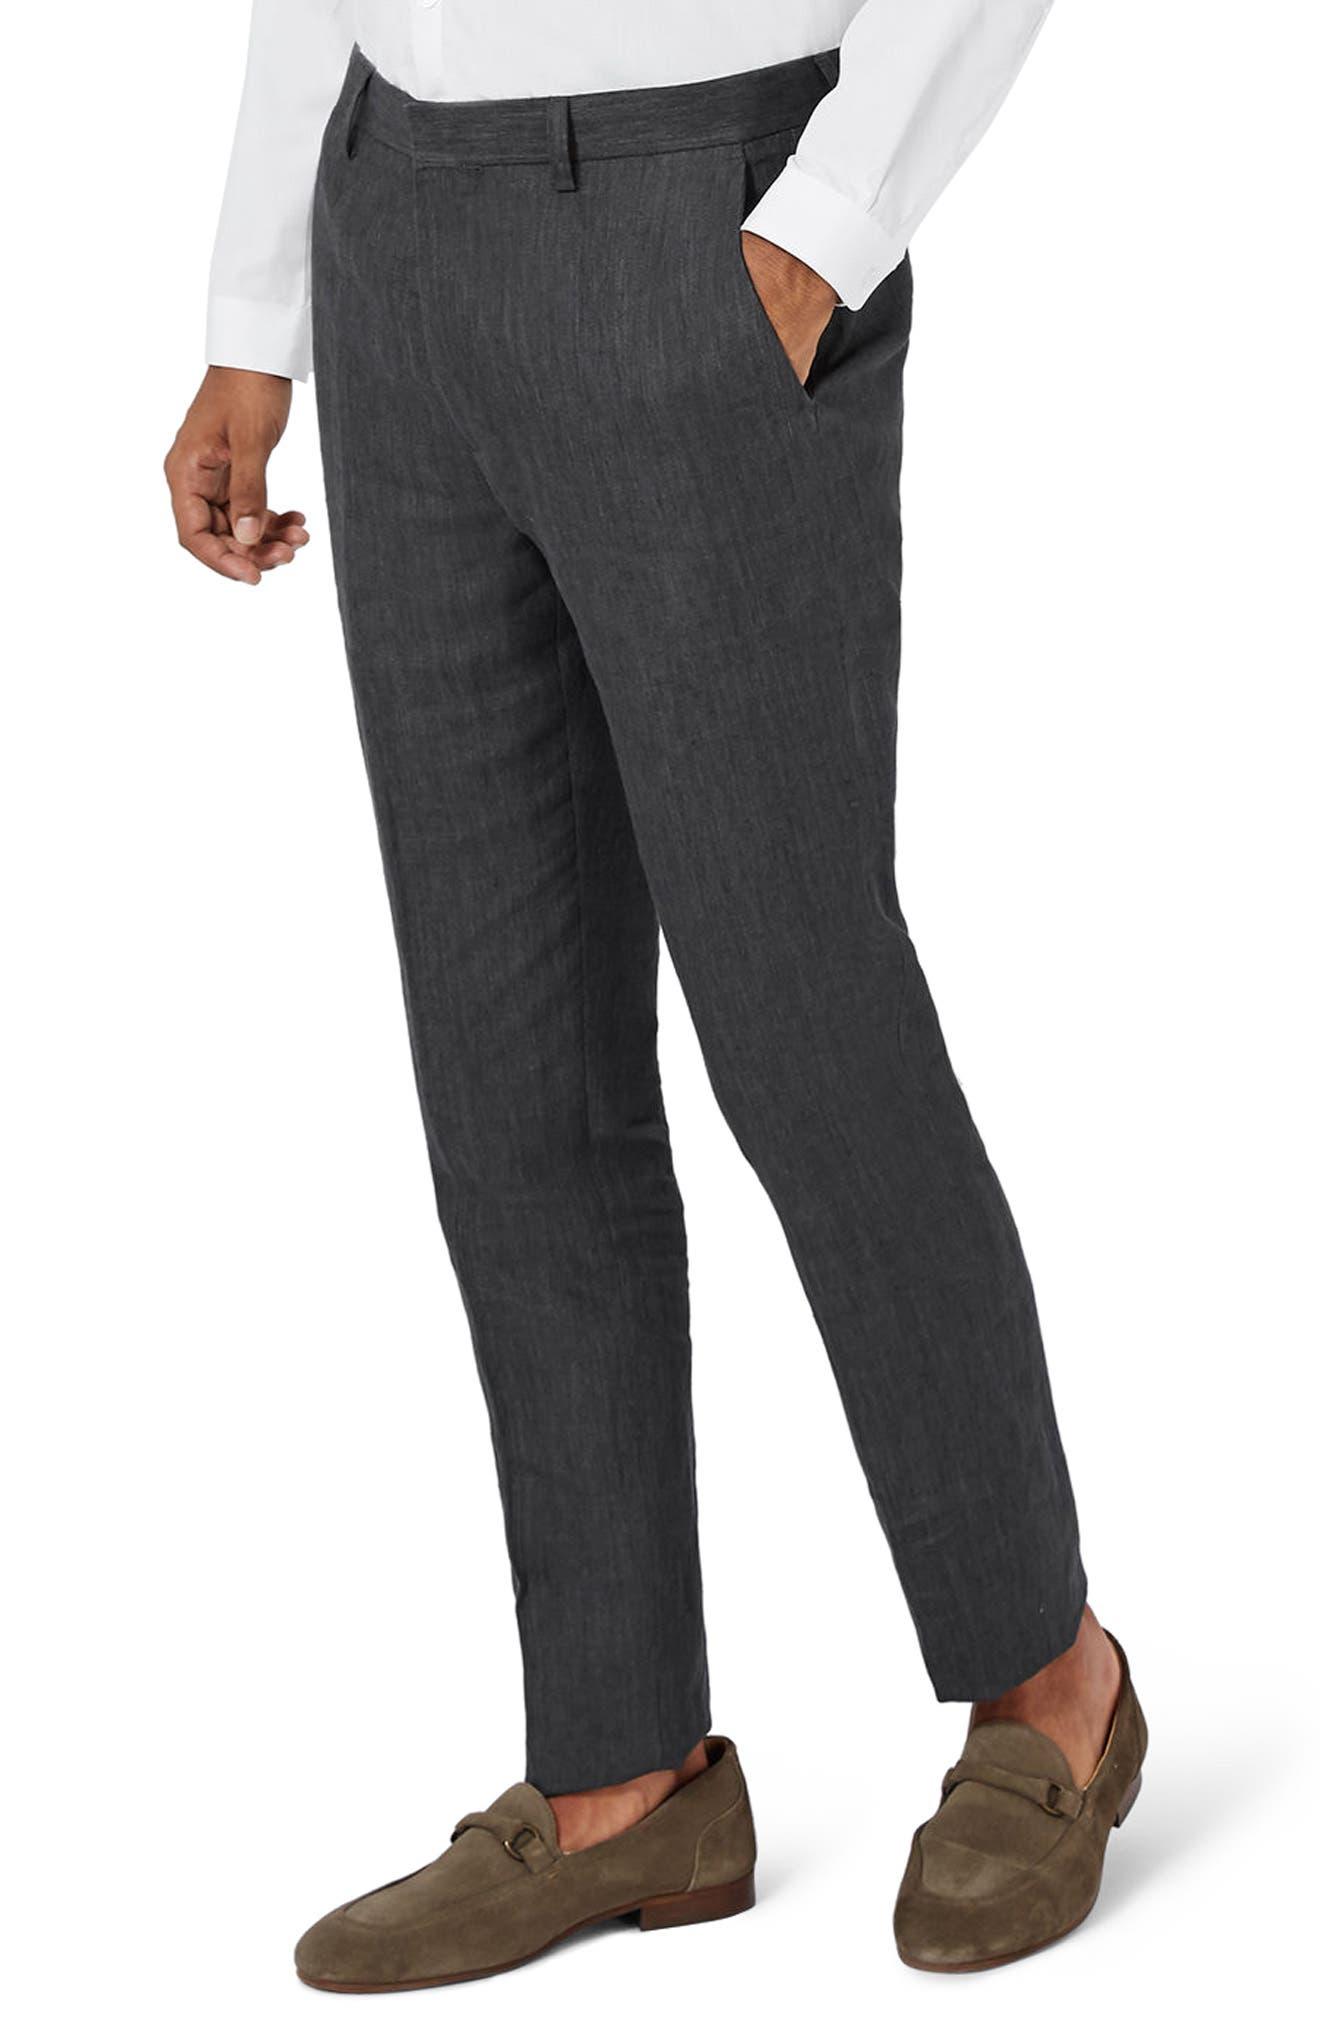 Topman Skinny Fit Linen Suit Trousers